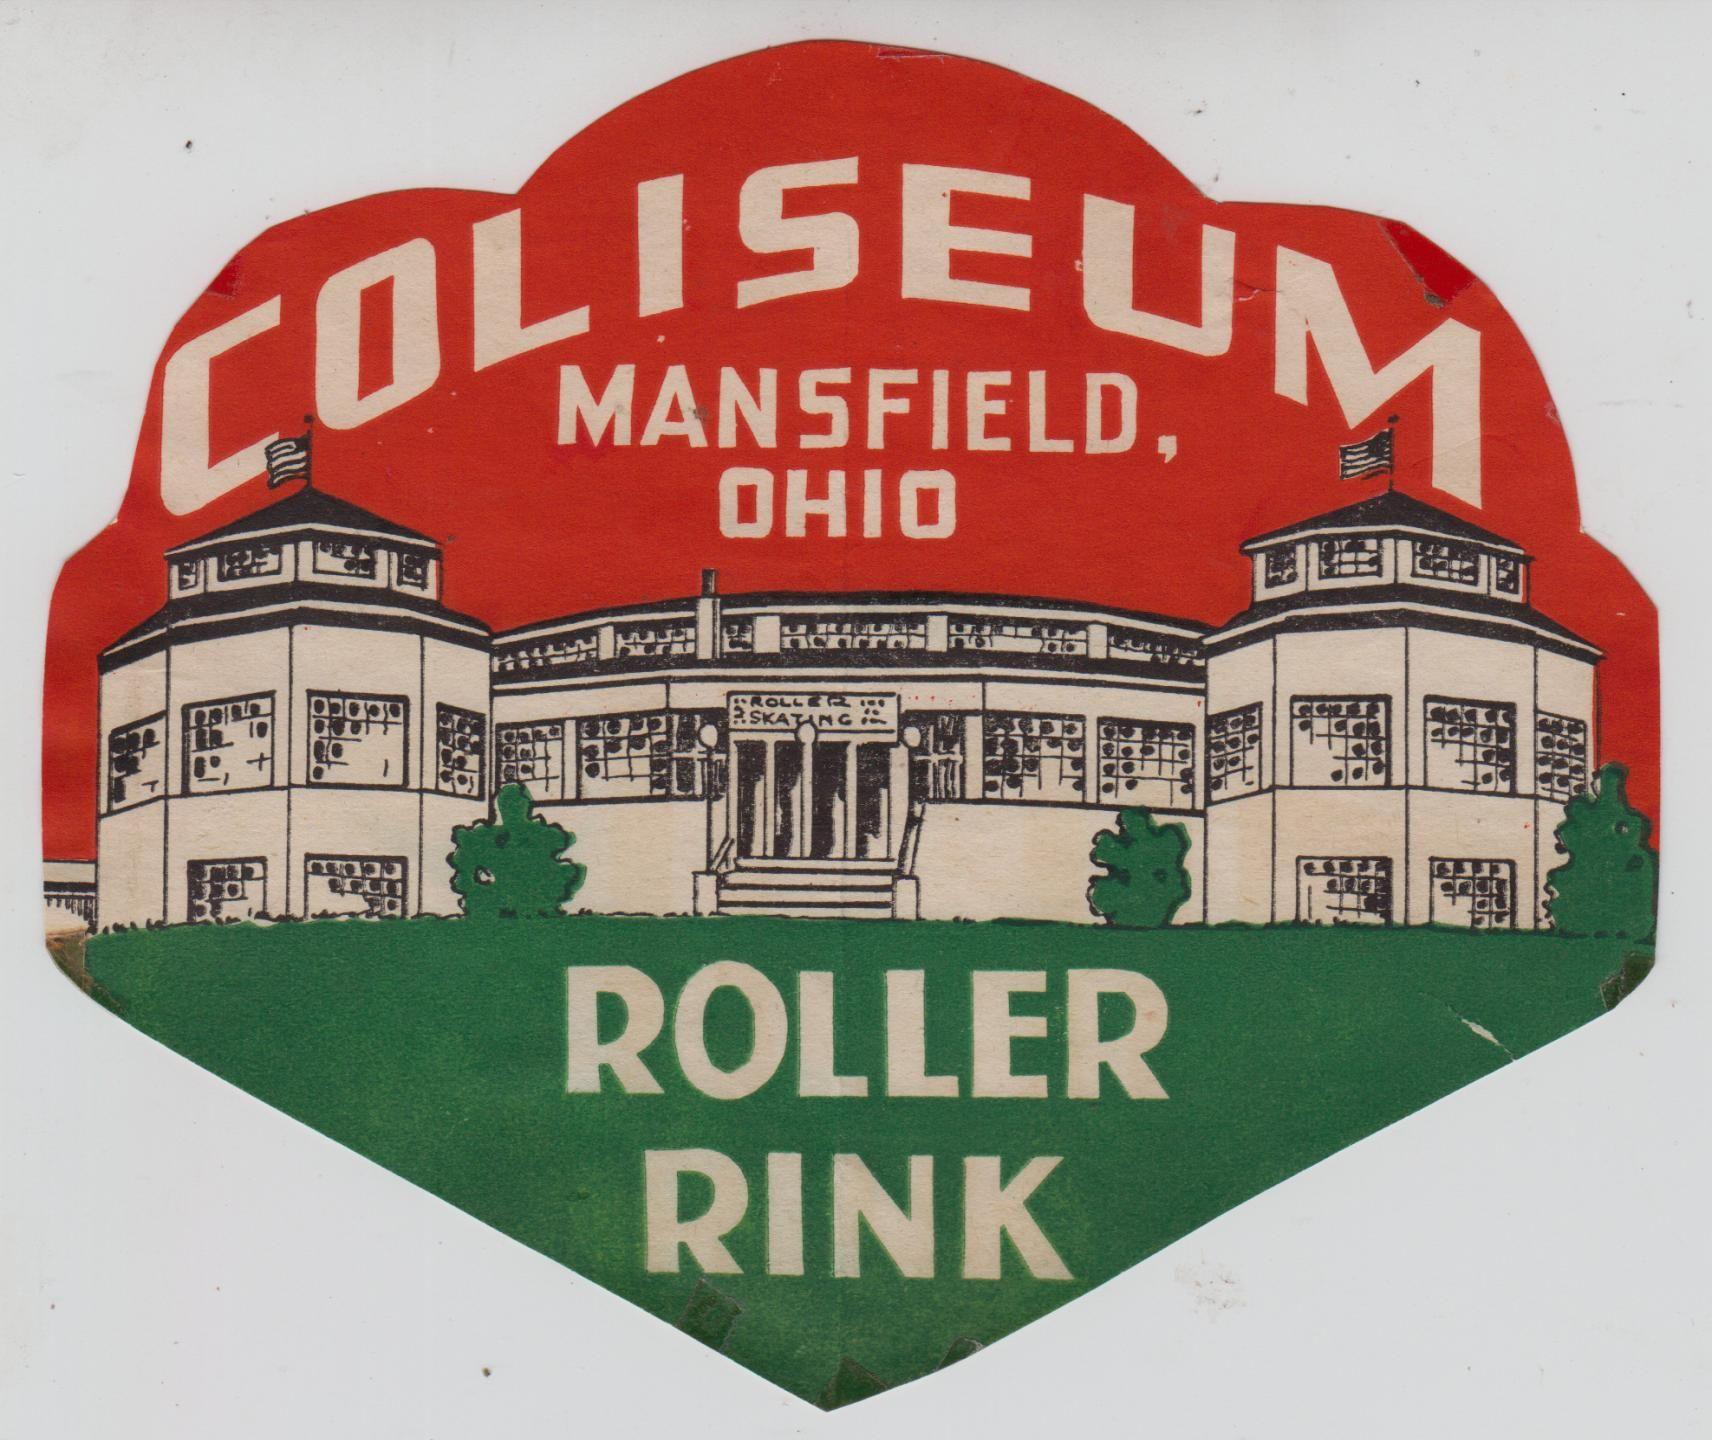 coliseum roller rink Roller rink, Ohio history